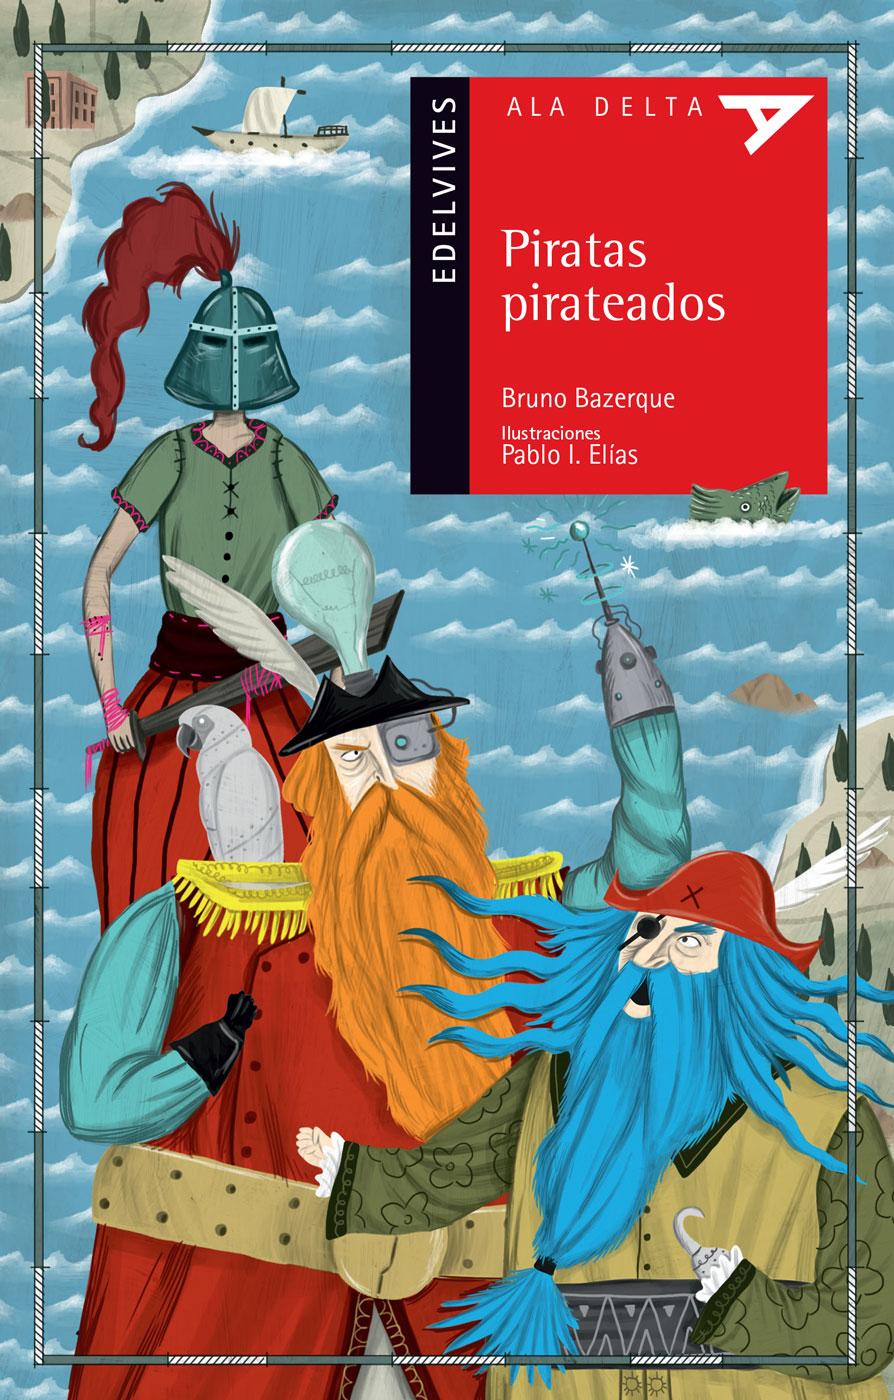 Piratas pirateados, editorial Edelvives